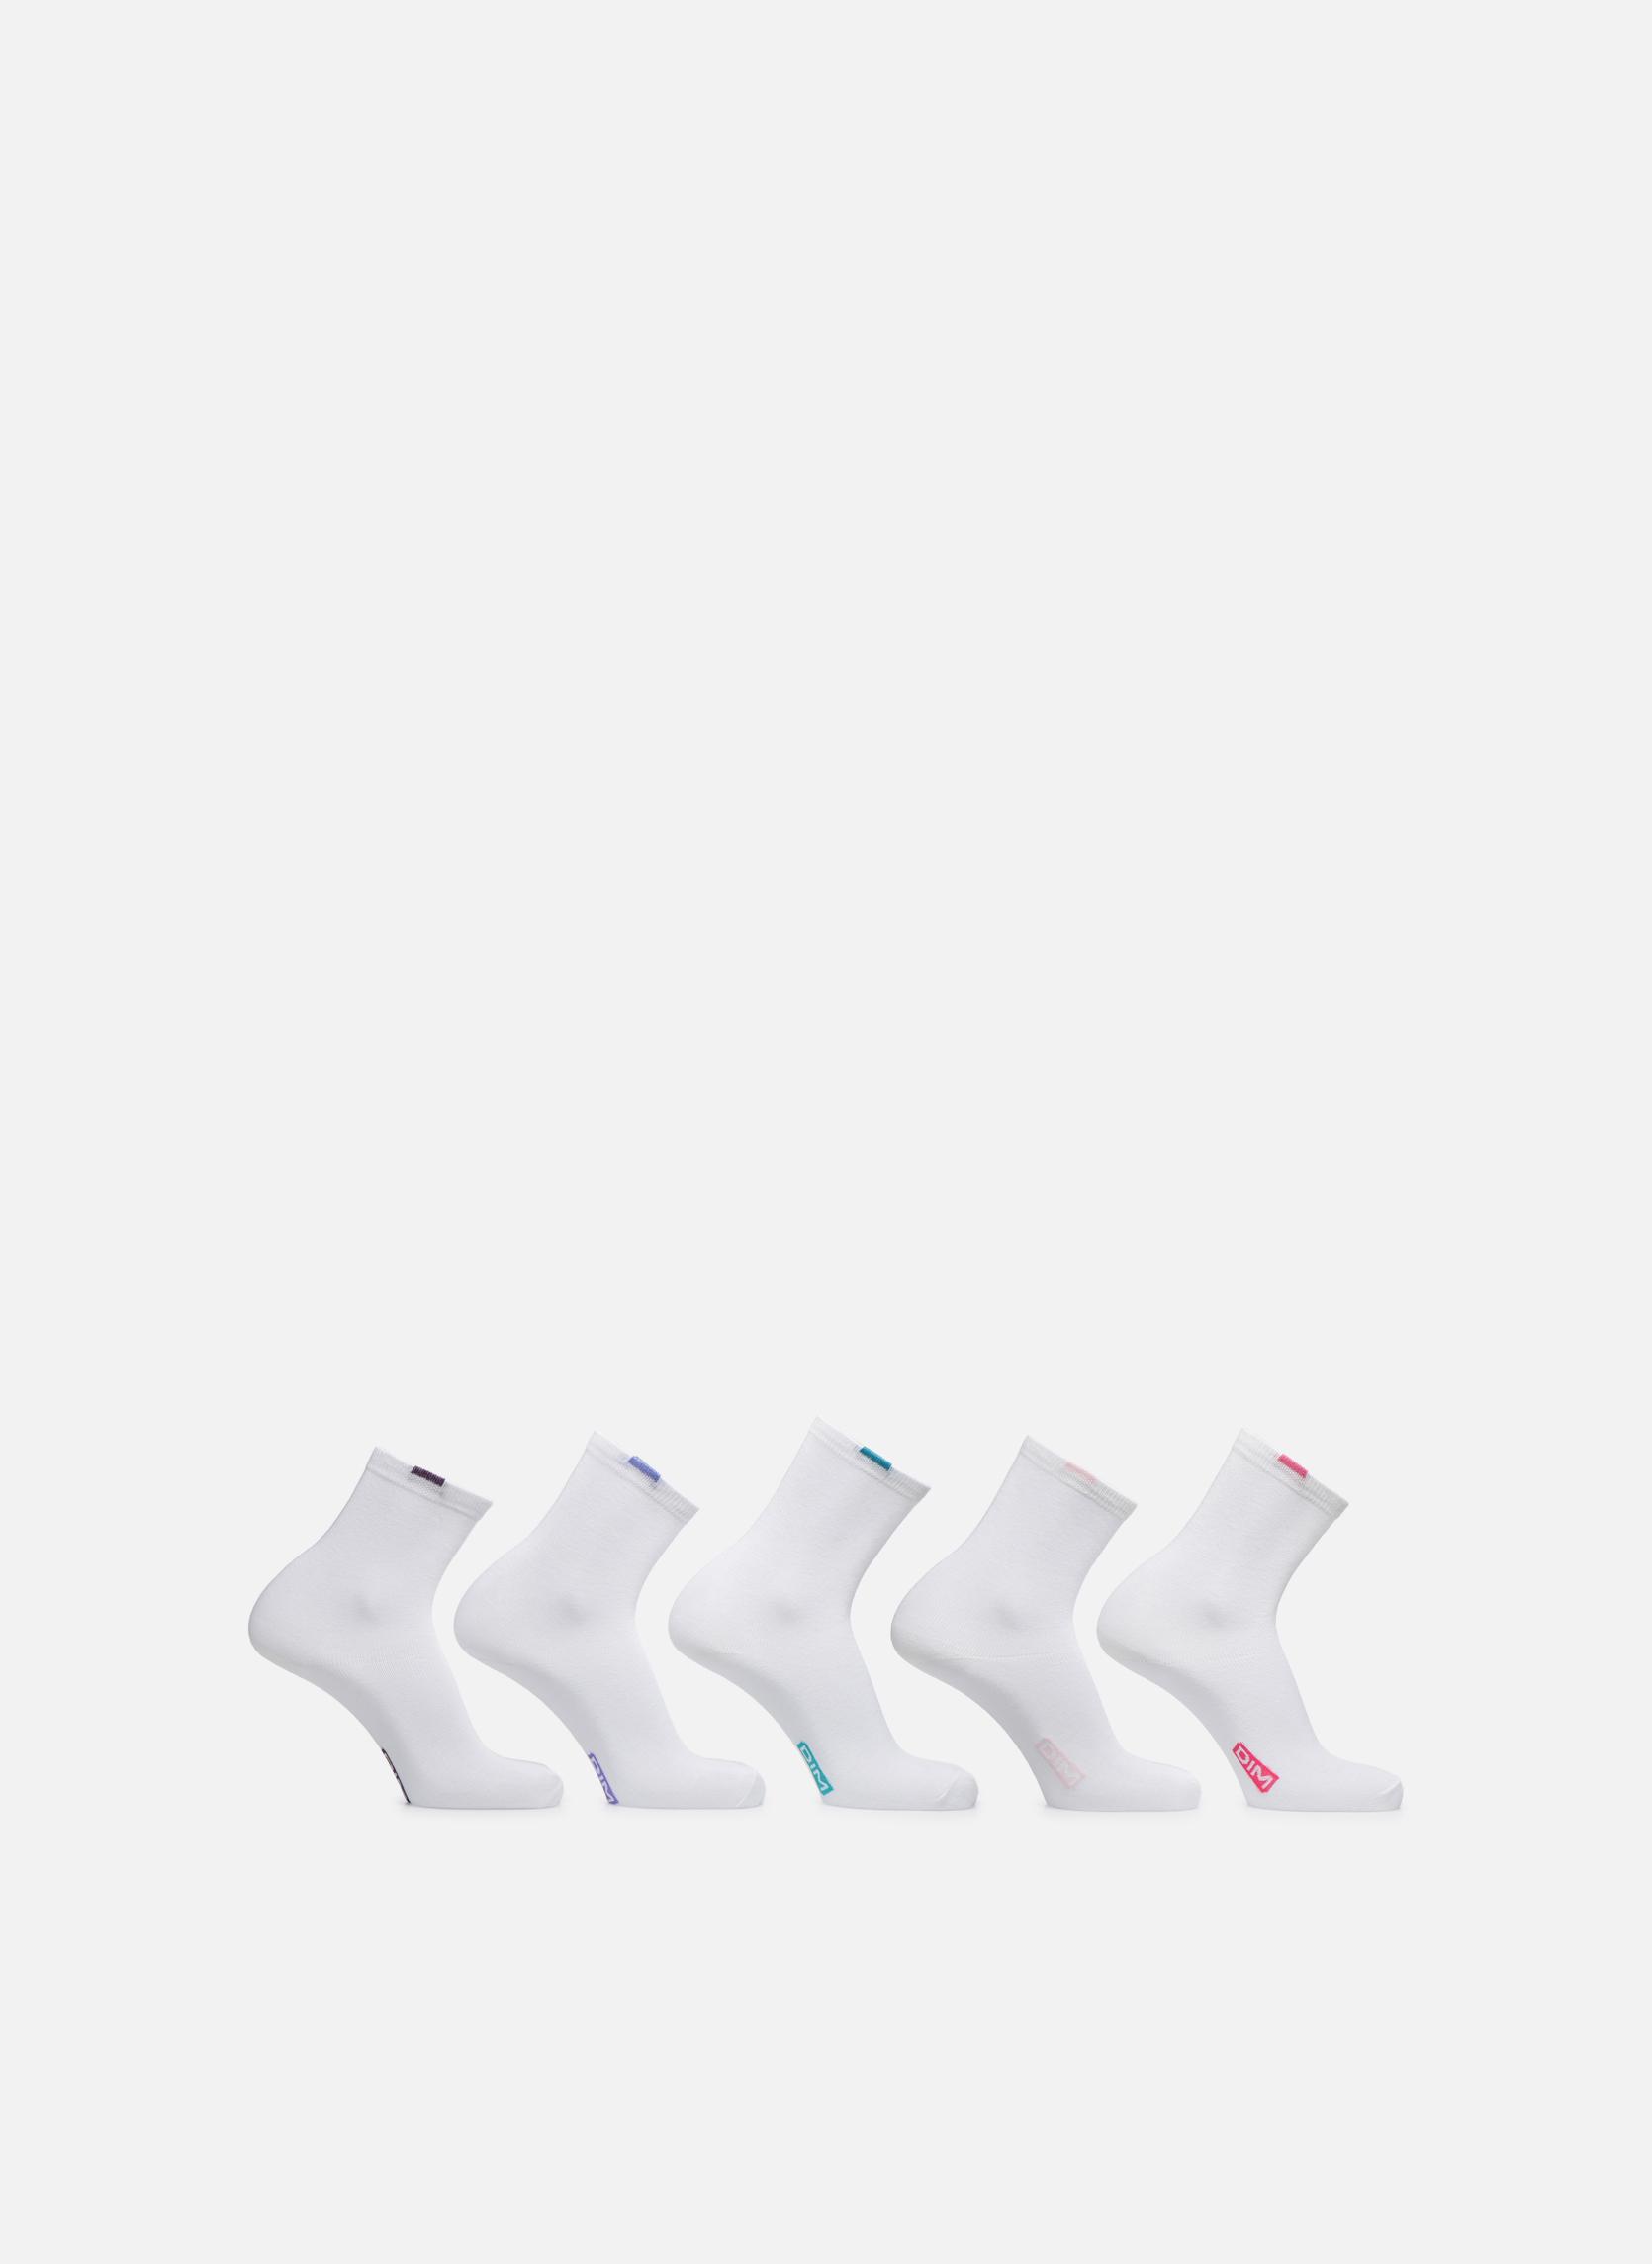 Chaussettes EcoDimW Pack de 5 0HY Blanc